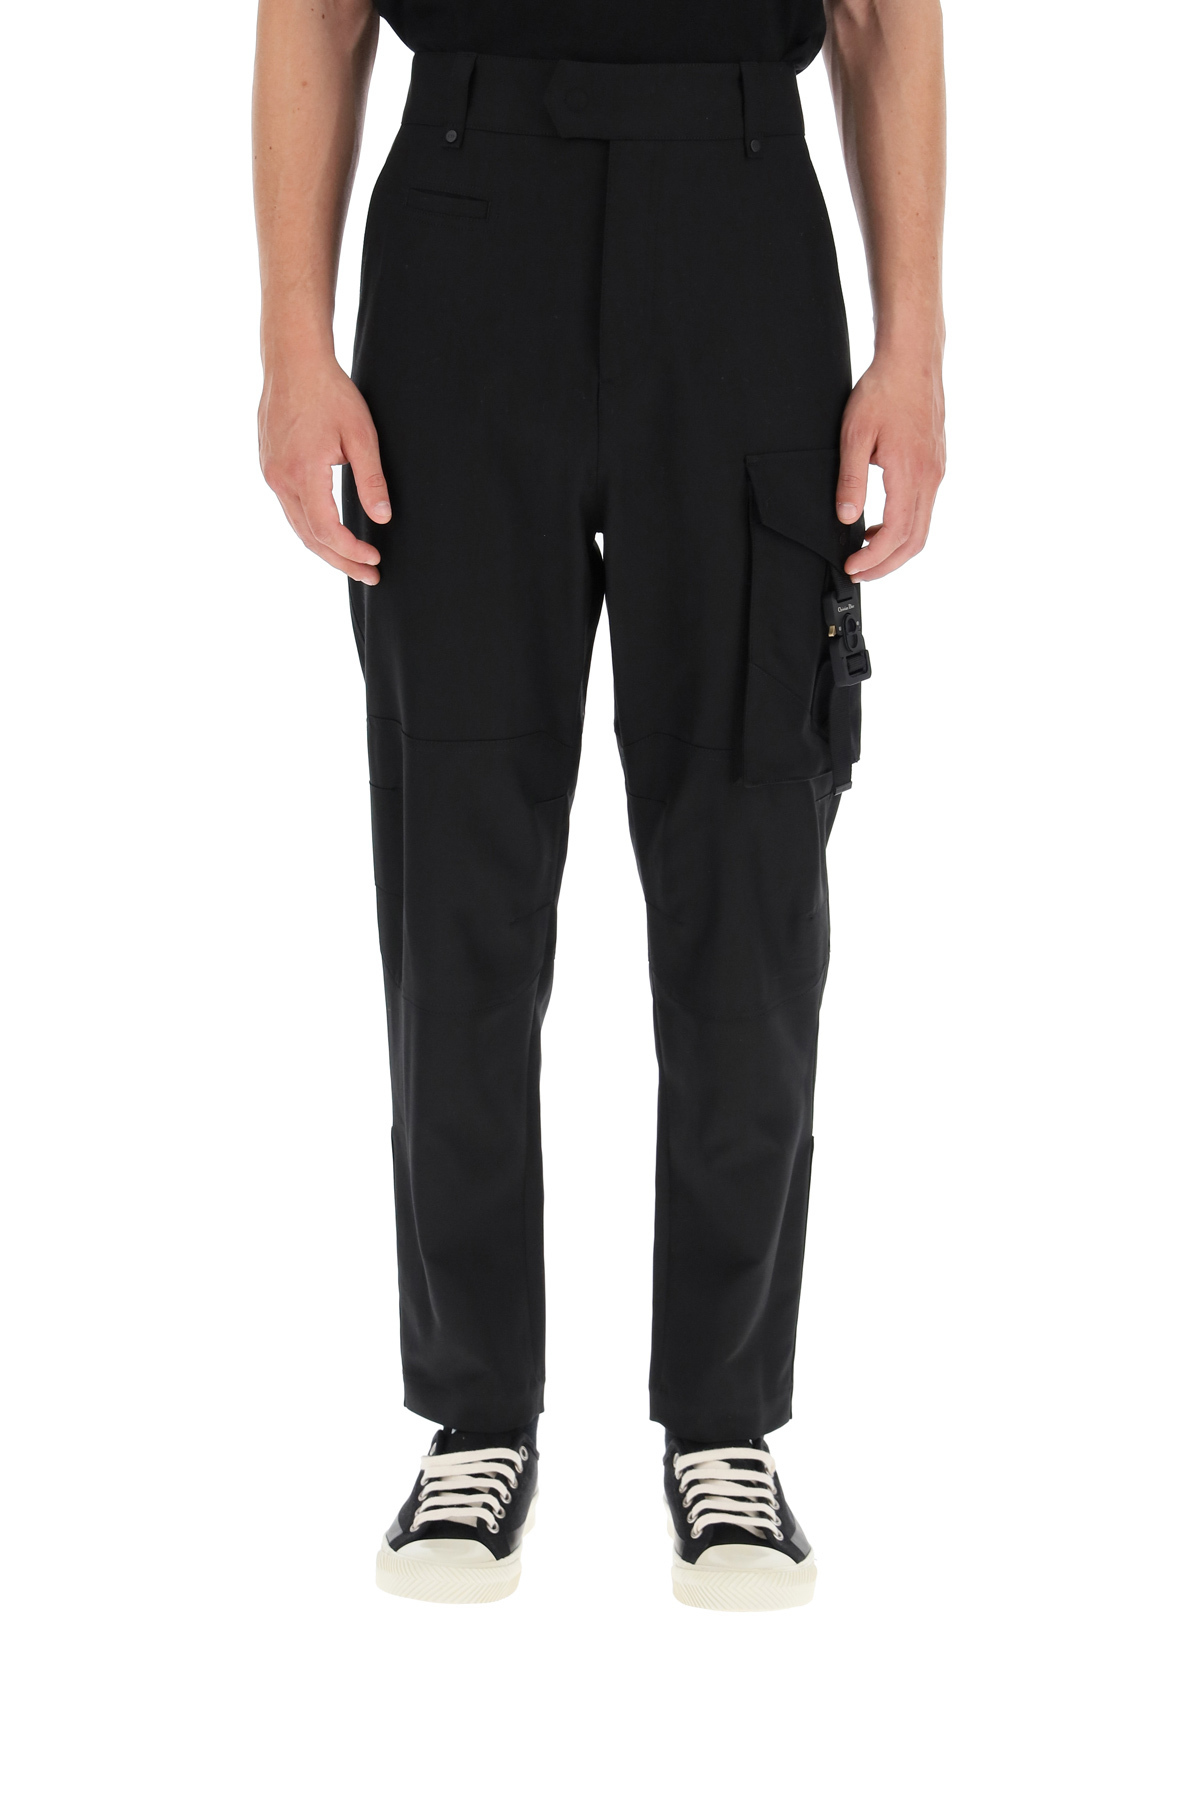 Dior pantaloni cargo con fibbia monogram